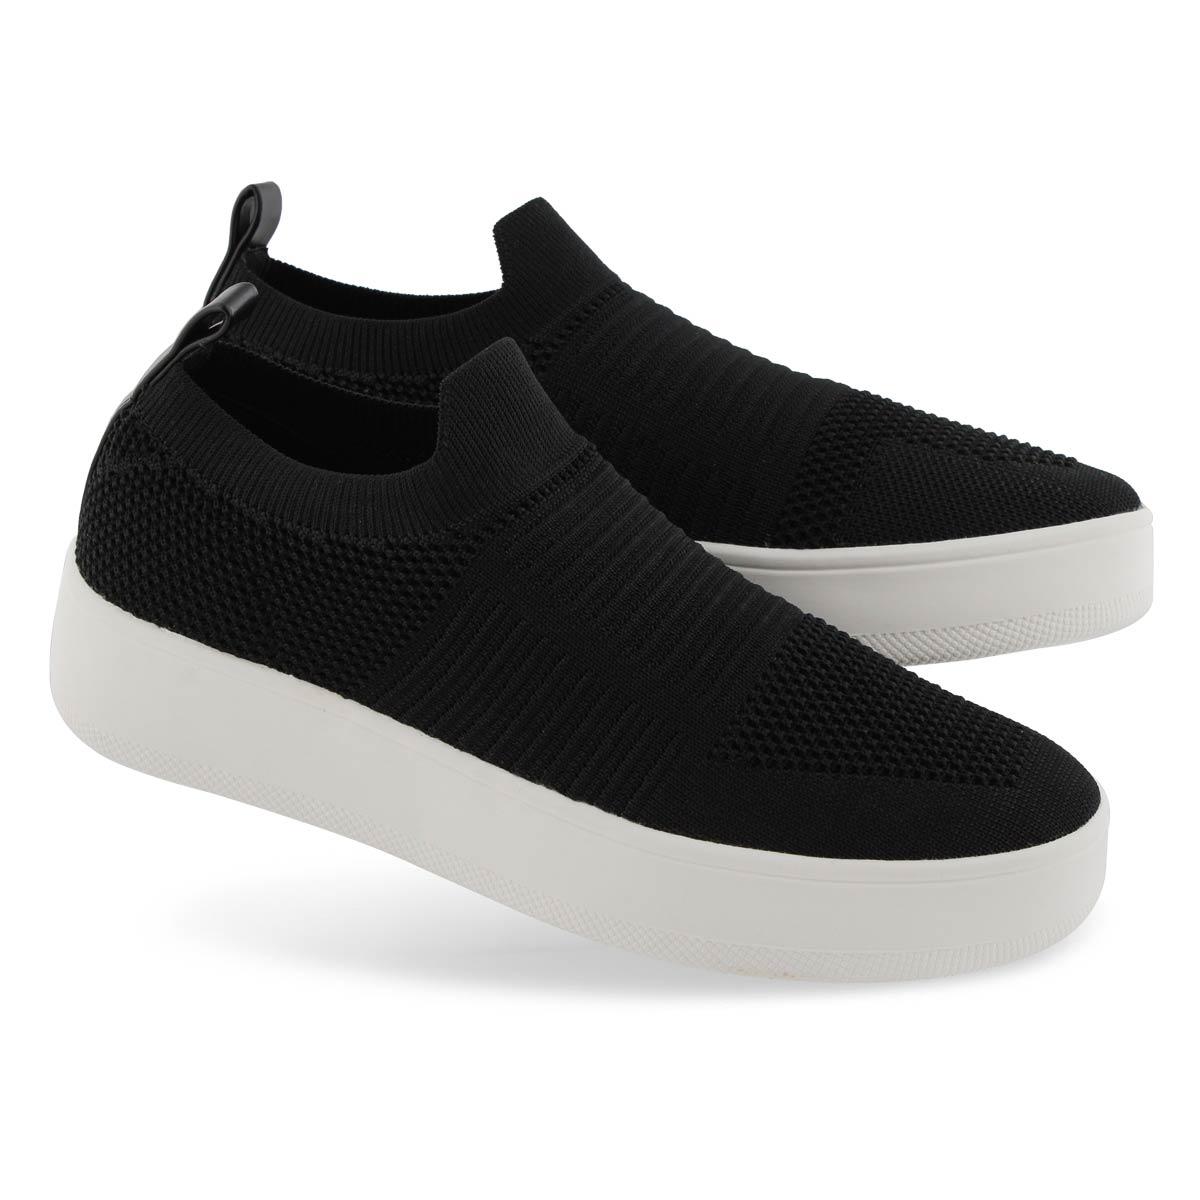 Lds Beale black slip on fashion sneakers